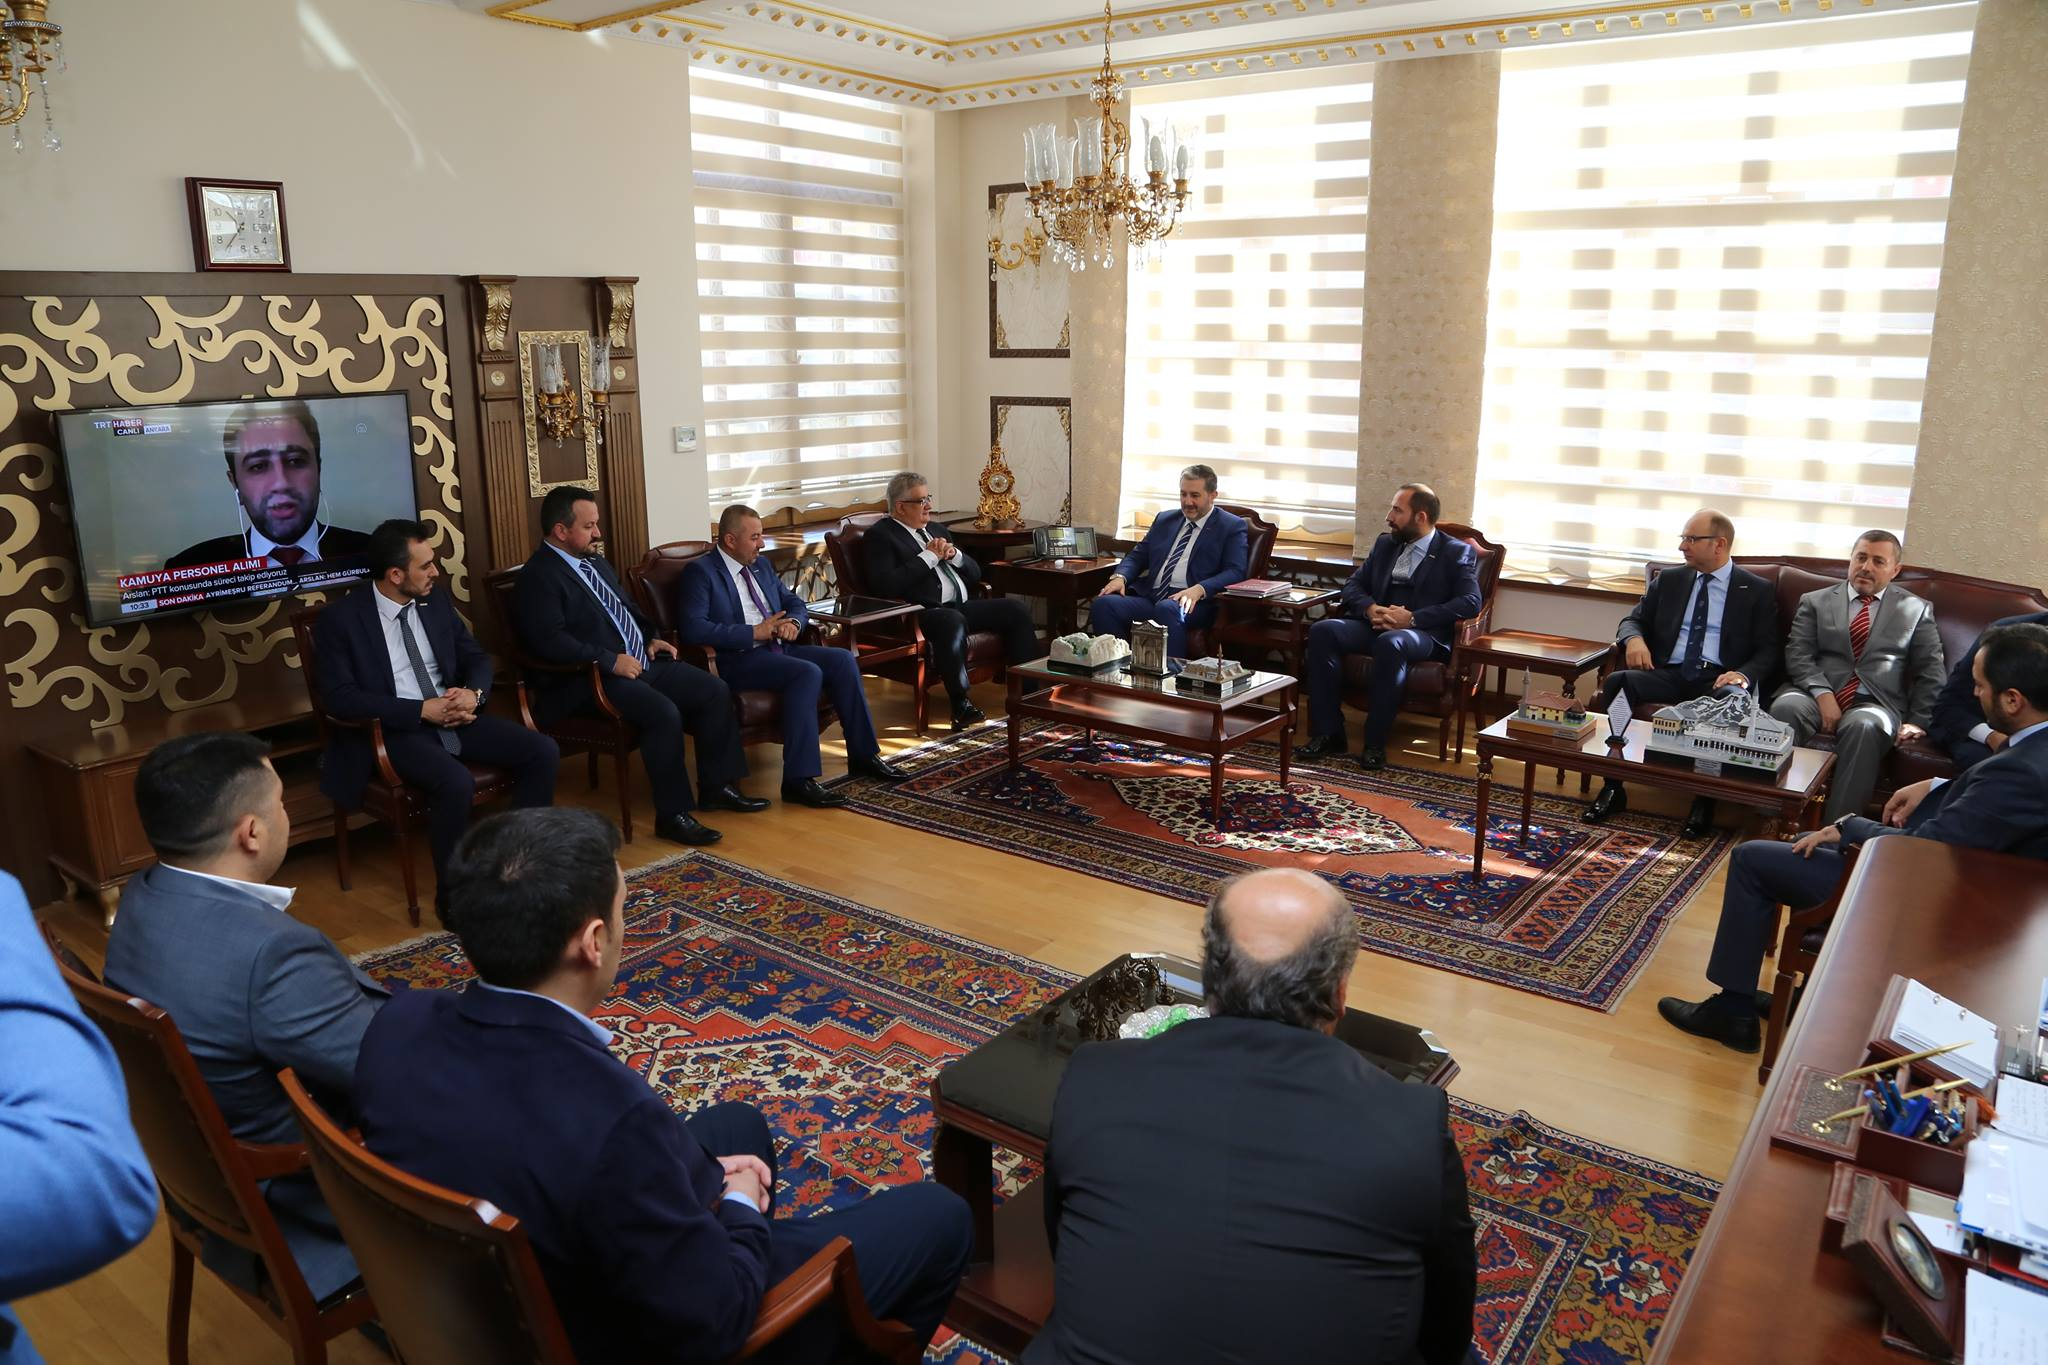 MÜSİAD Genel Başkanı Abdurrahman Kaan Vali Aykut Pekmez'i ziyaret etti